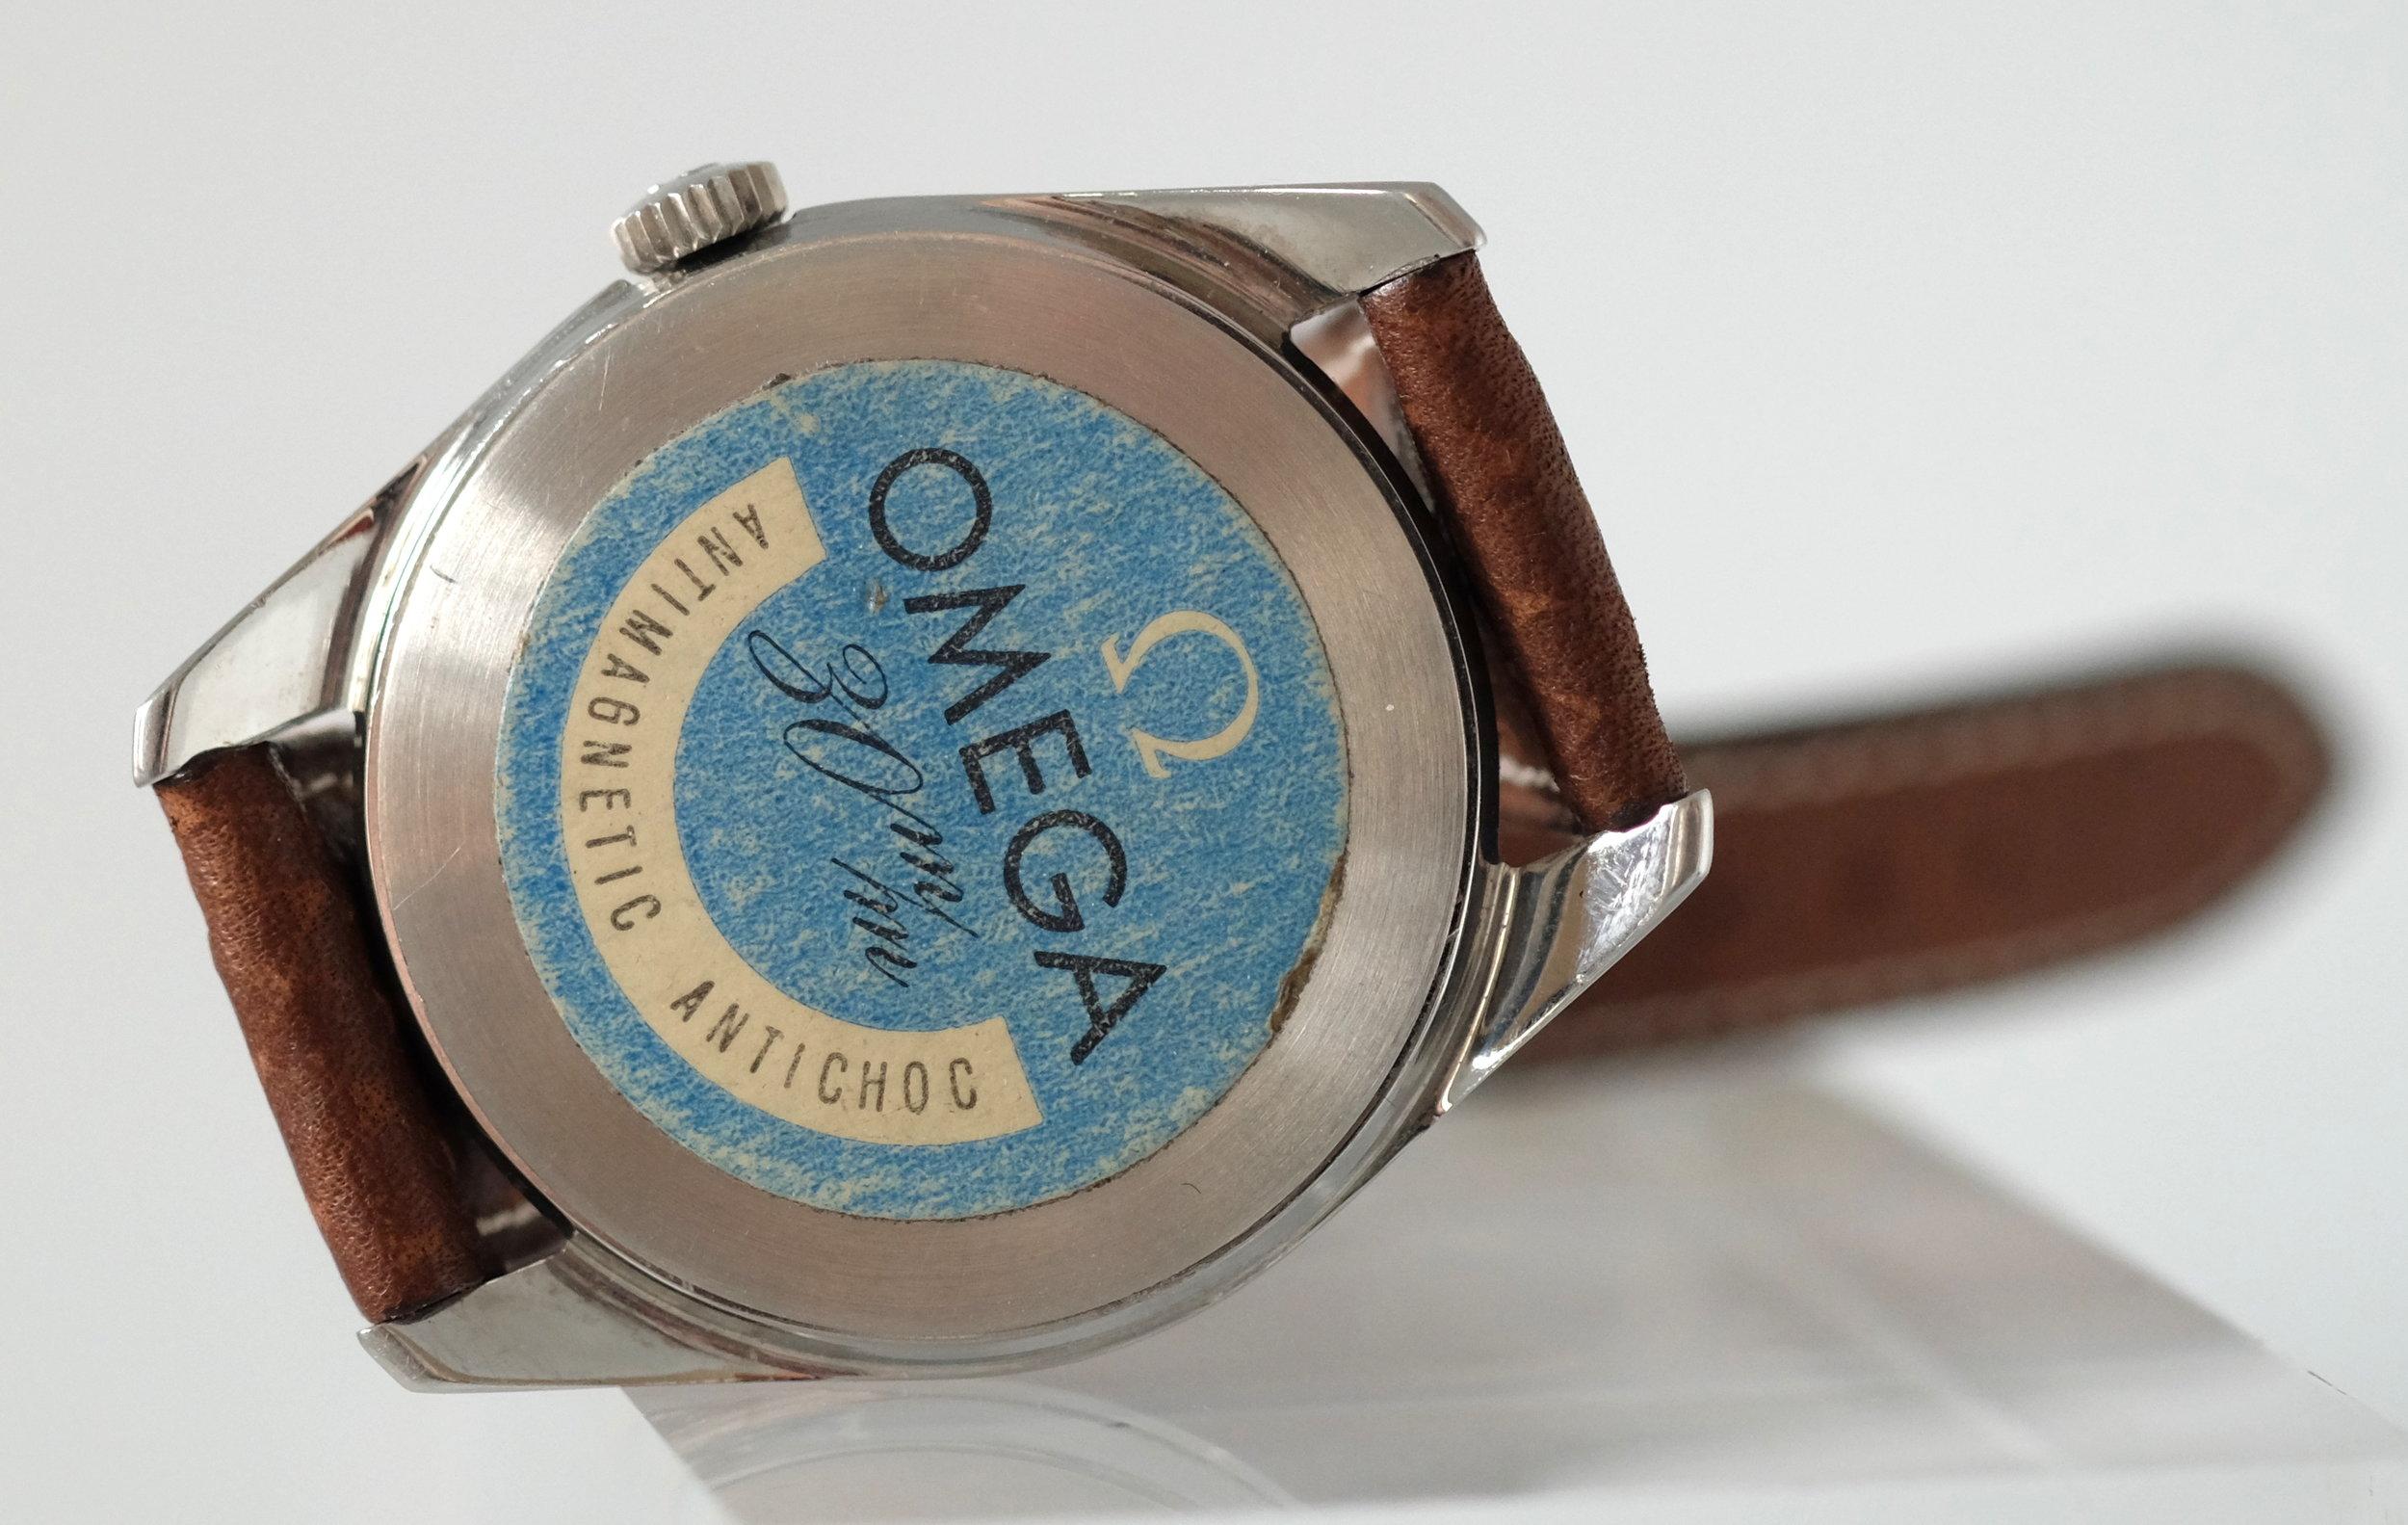 omega-ranchero-back-sticker